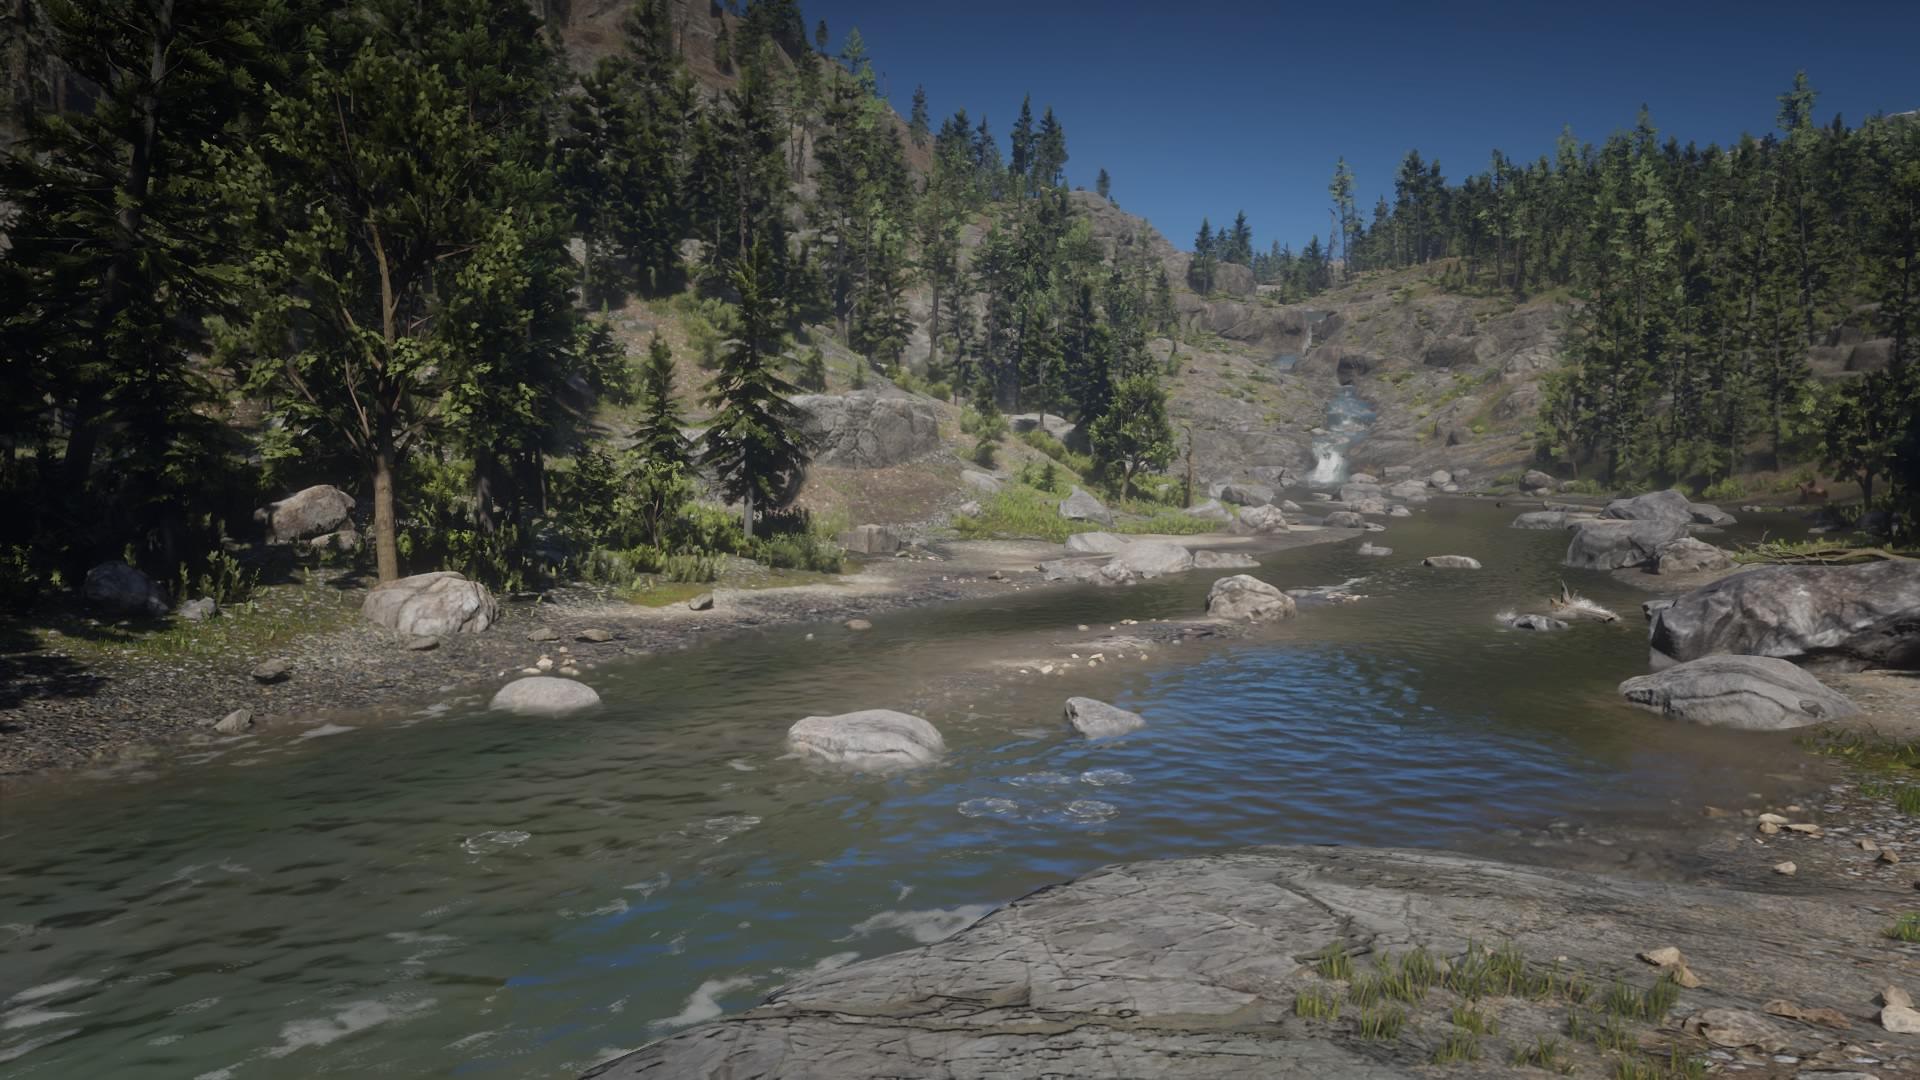 Upper Montana River